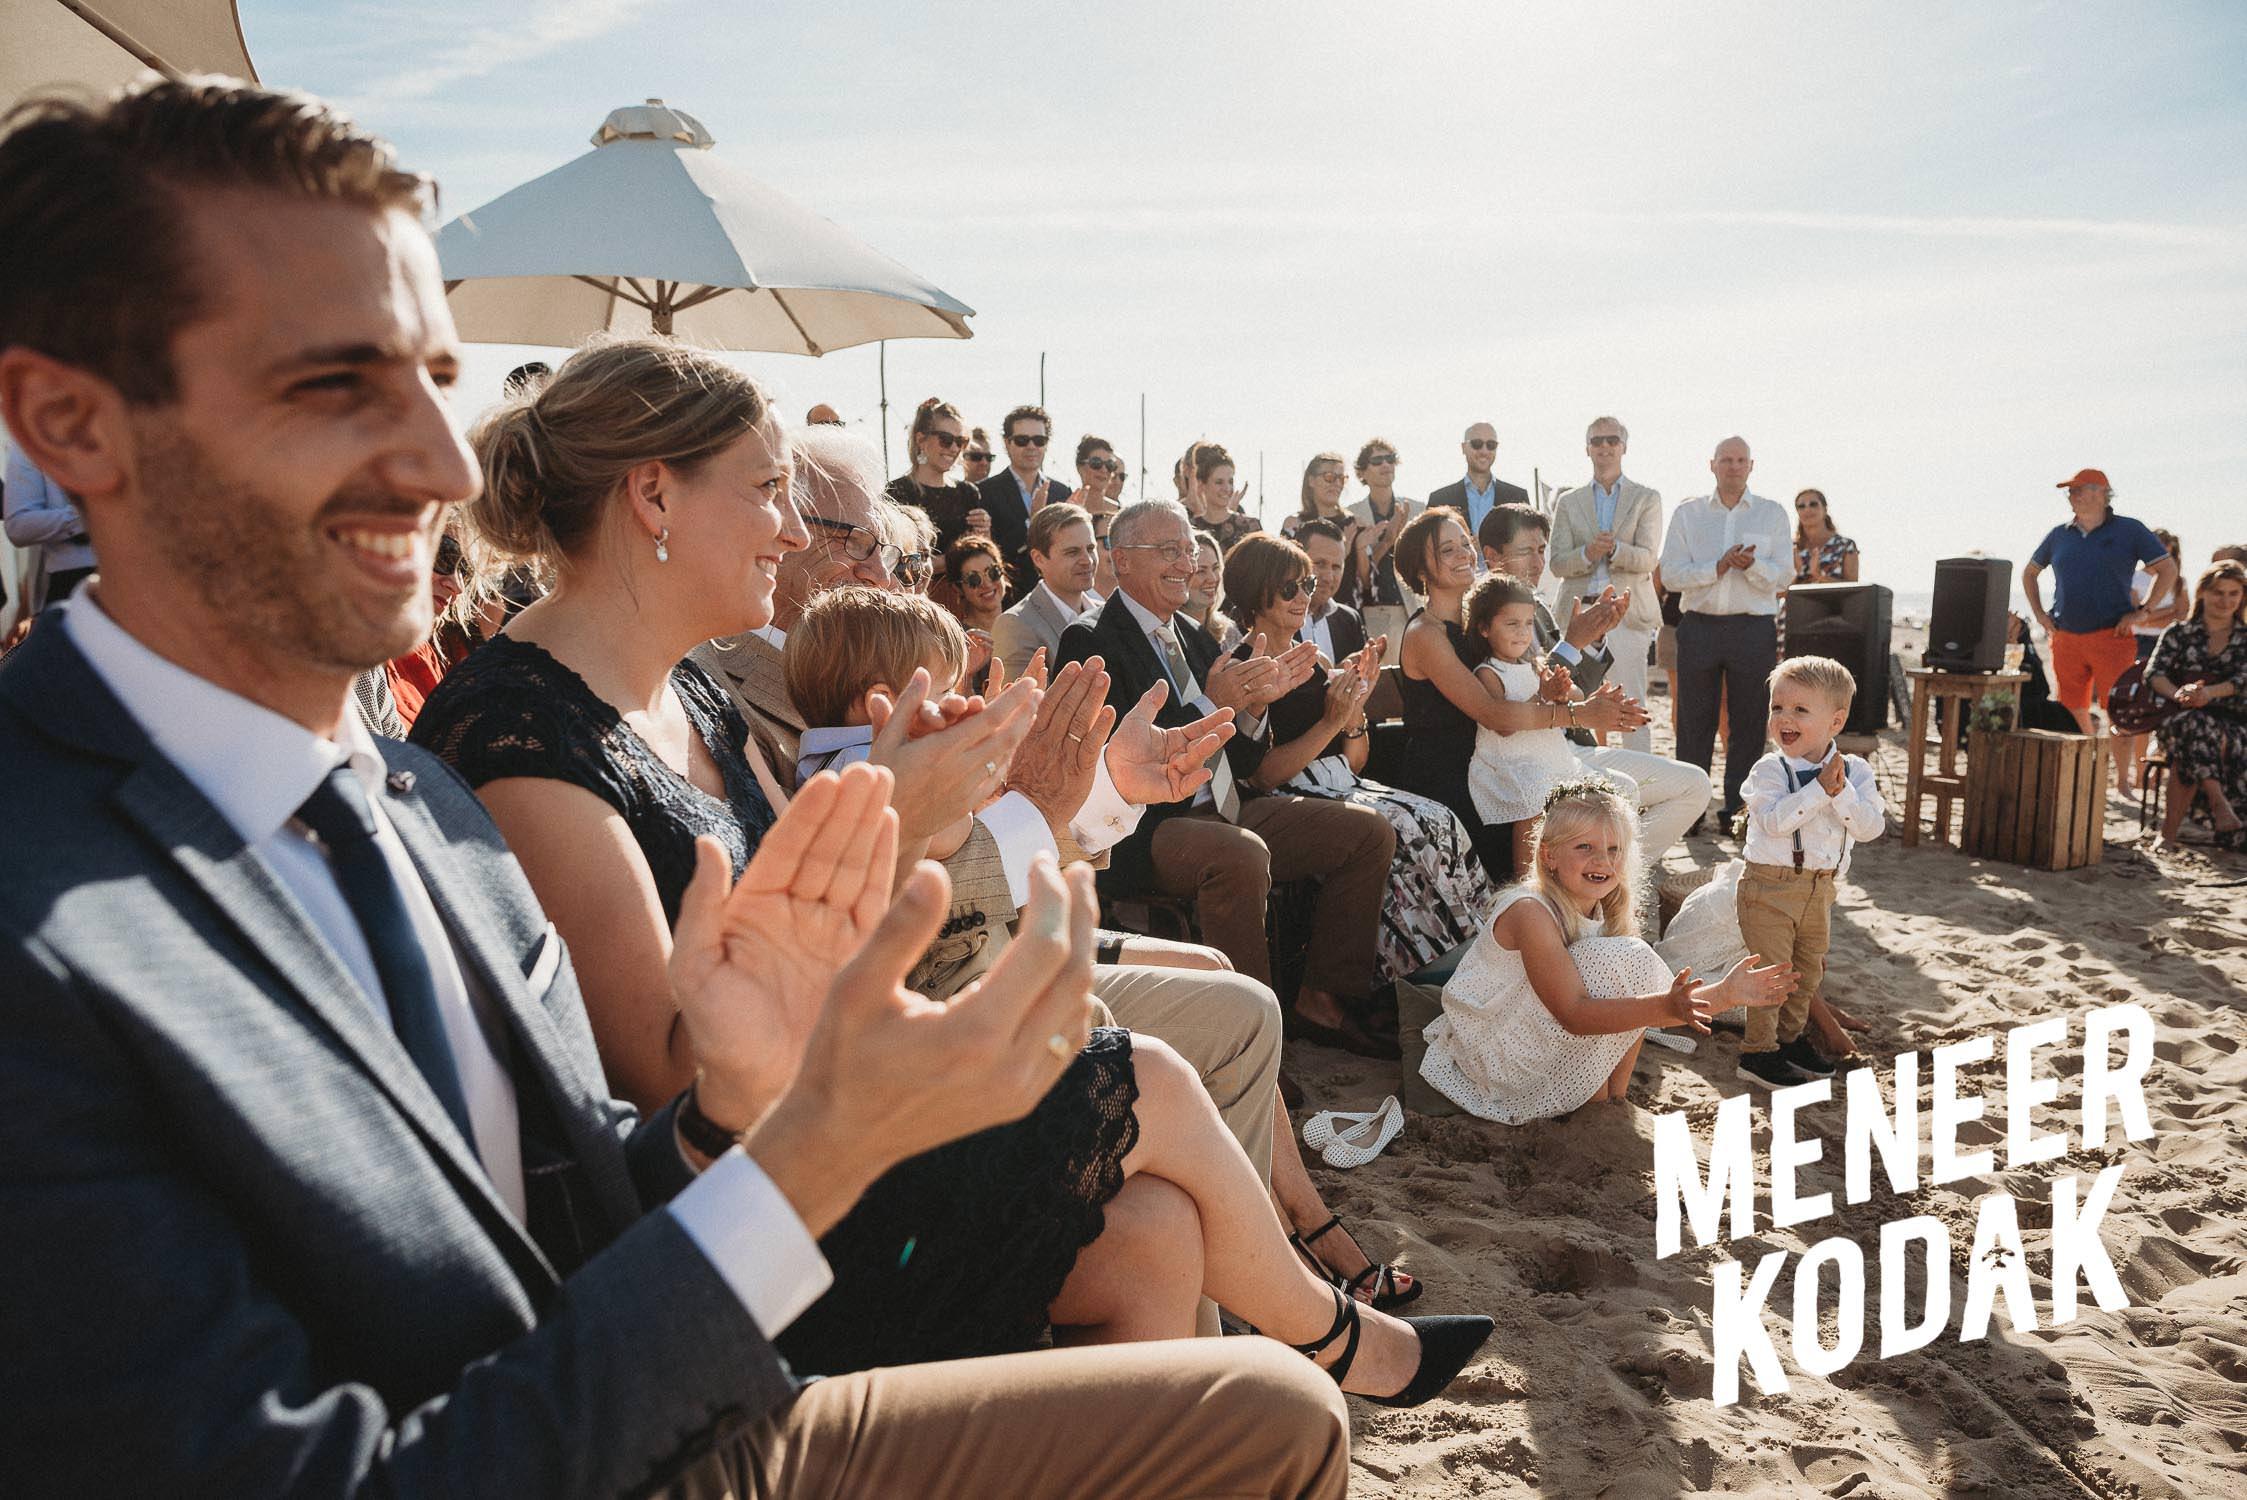 Meneer Kodak - Strandbruiloft - Noordwijk - K&A-087.jpg